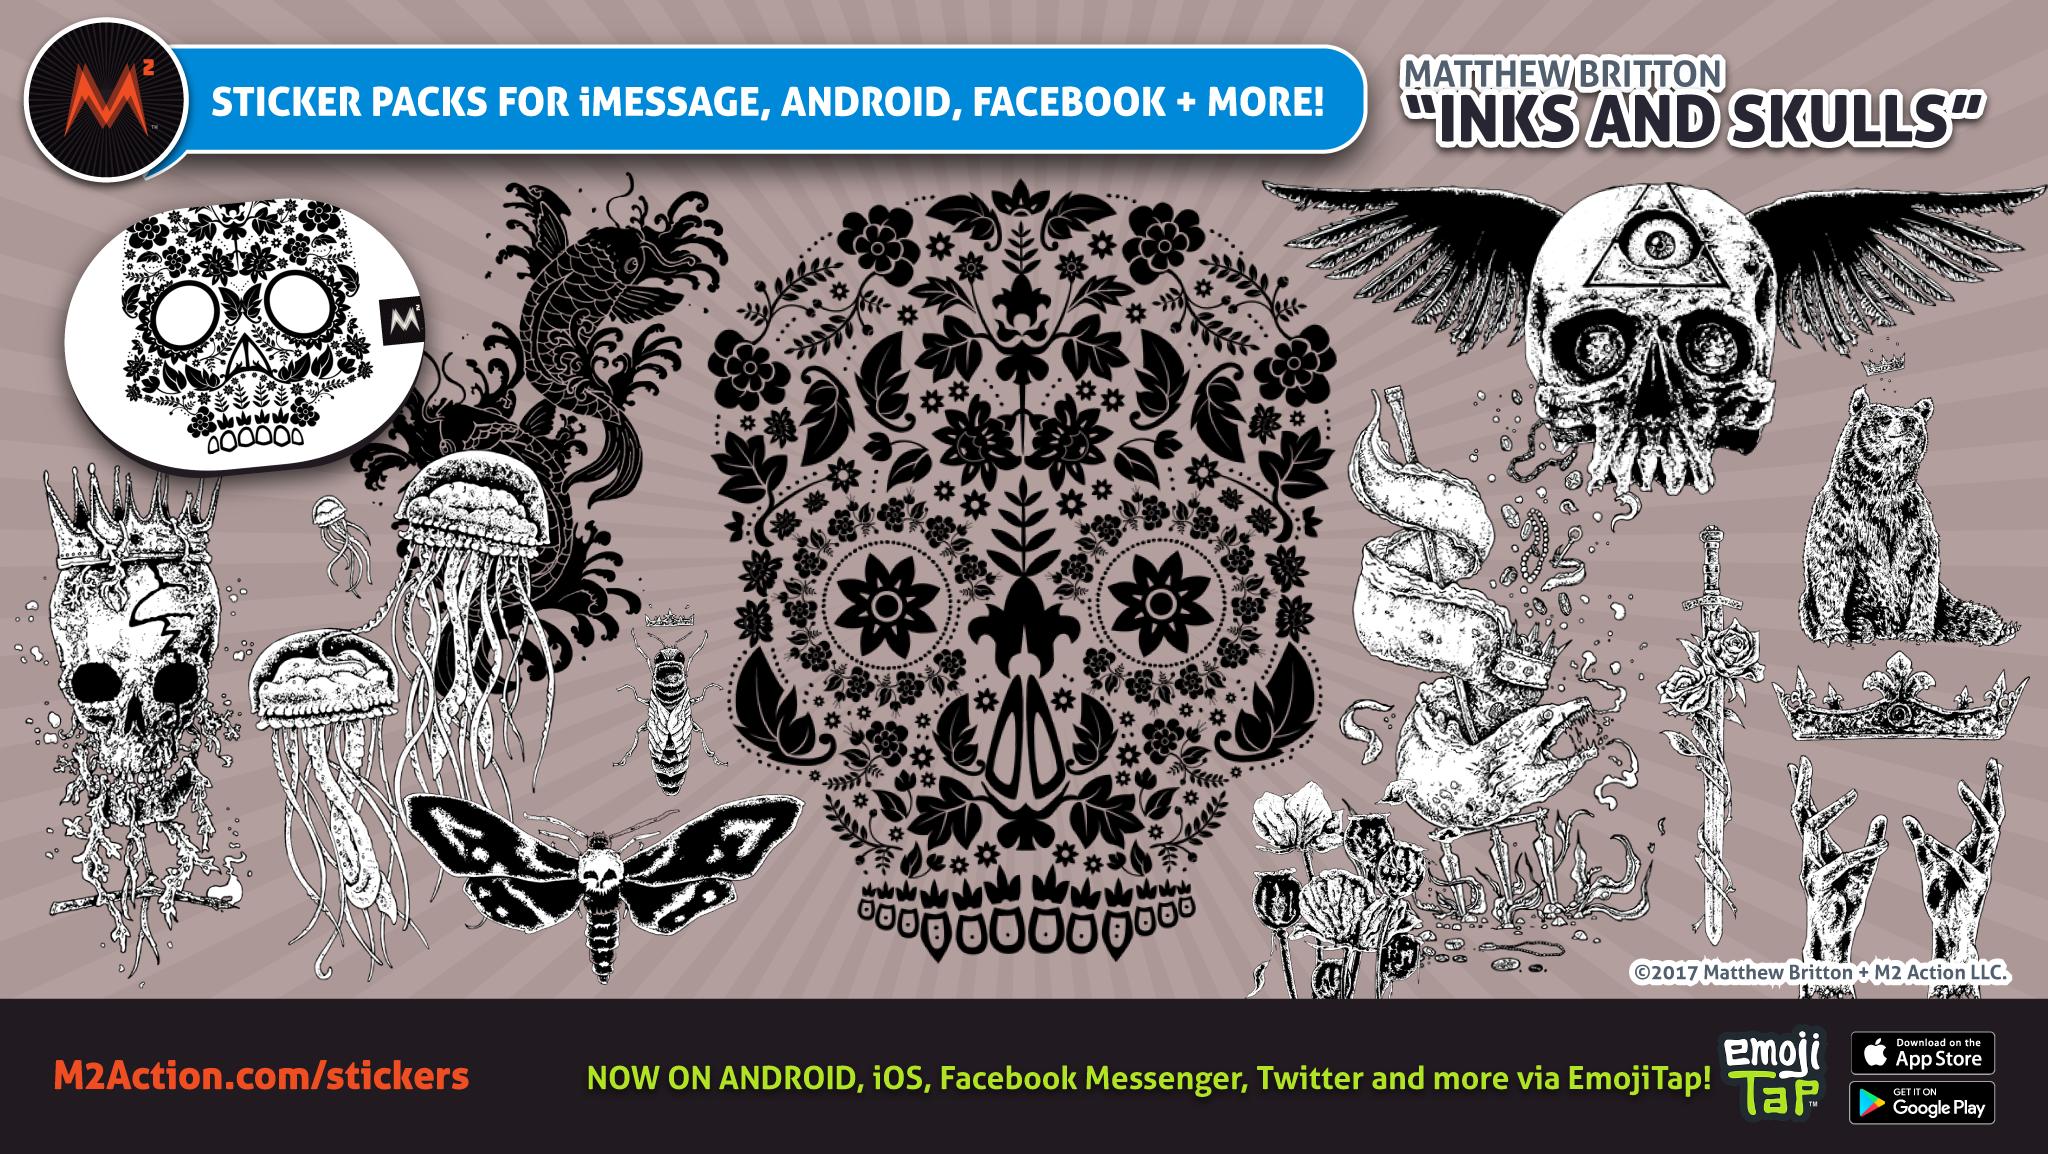 M2_Stickers_Promos_April2017_MatthewBritton_InksAndSkulls.png